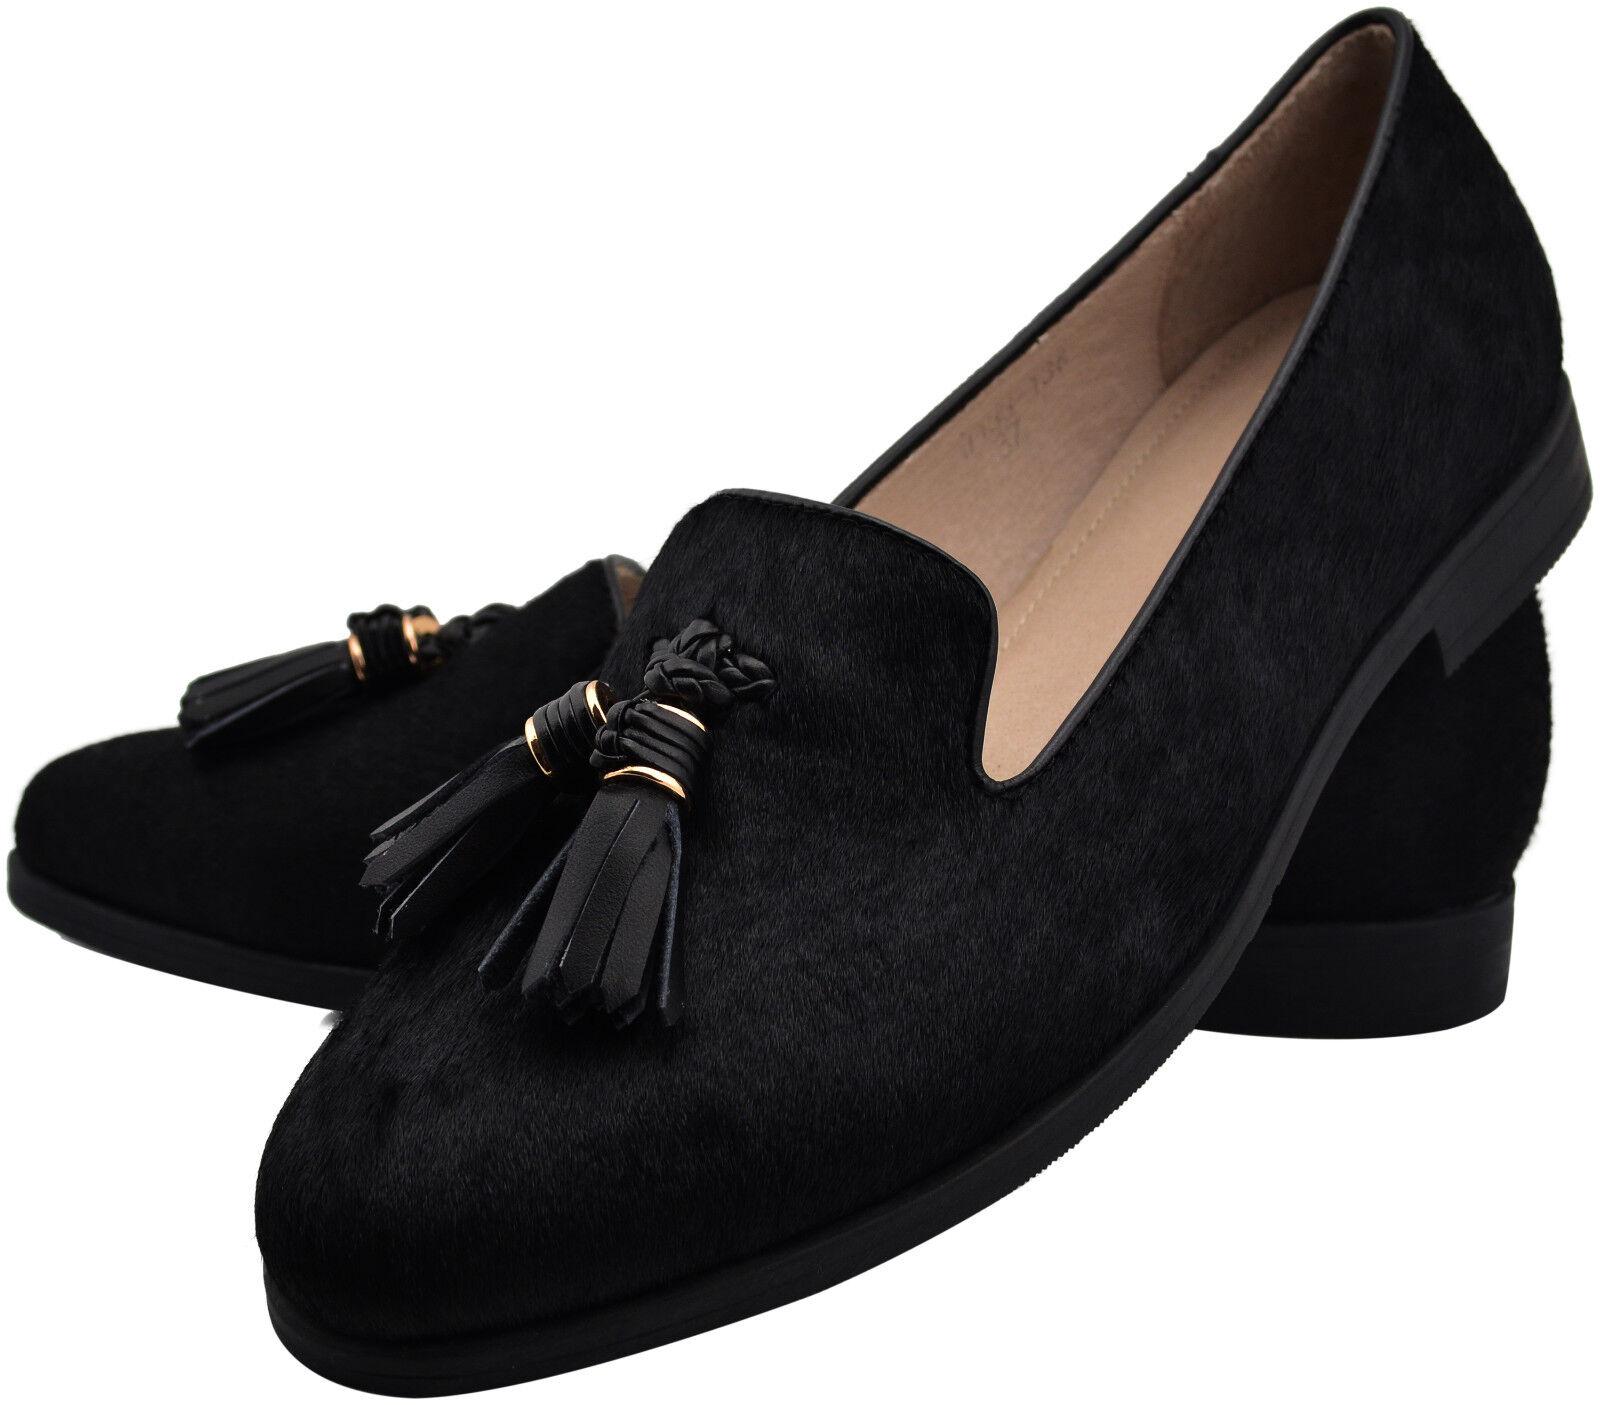 Loafer cuero tasselloafer negro negro negro fell borlas tassels par individuales tamaño 36  Ahorre 35% - 70% de descuento